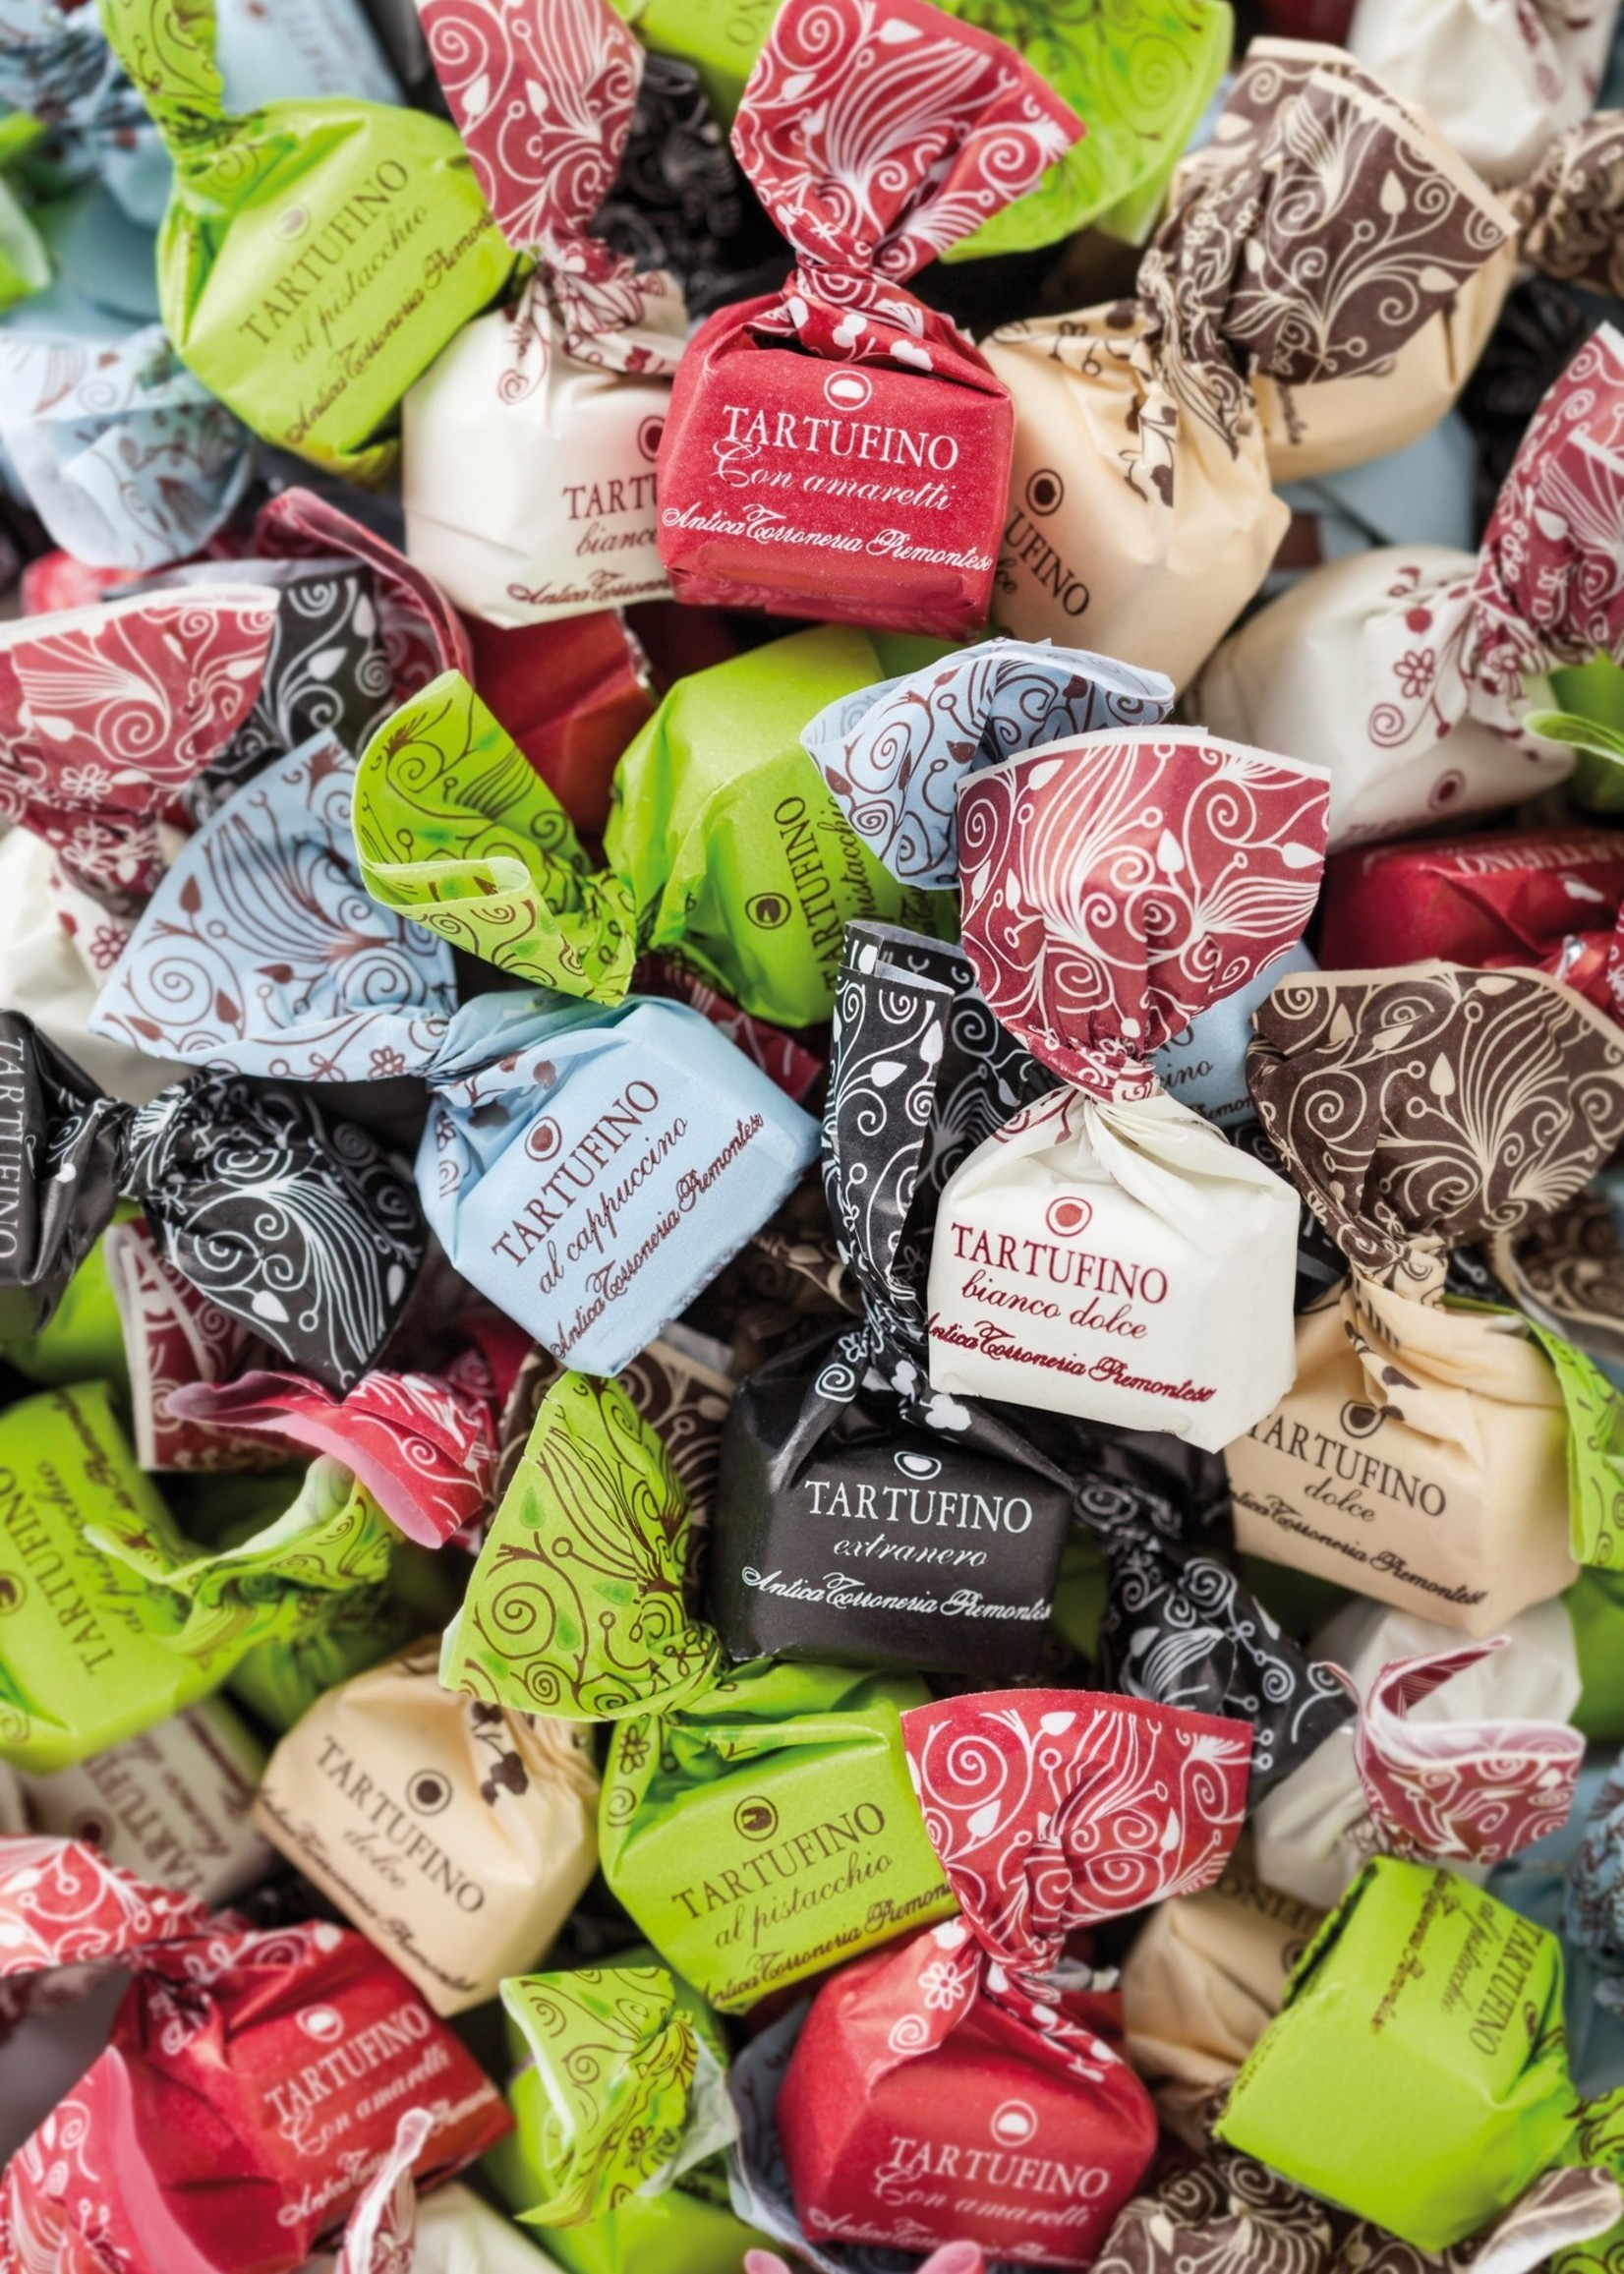 original Italian Tartufo truffle - Copy